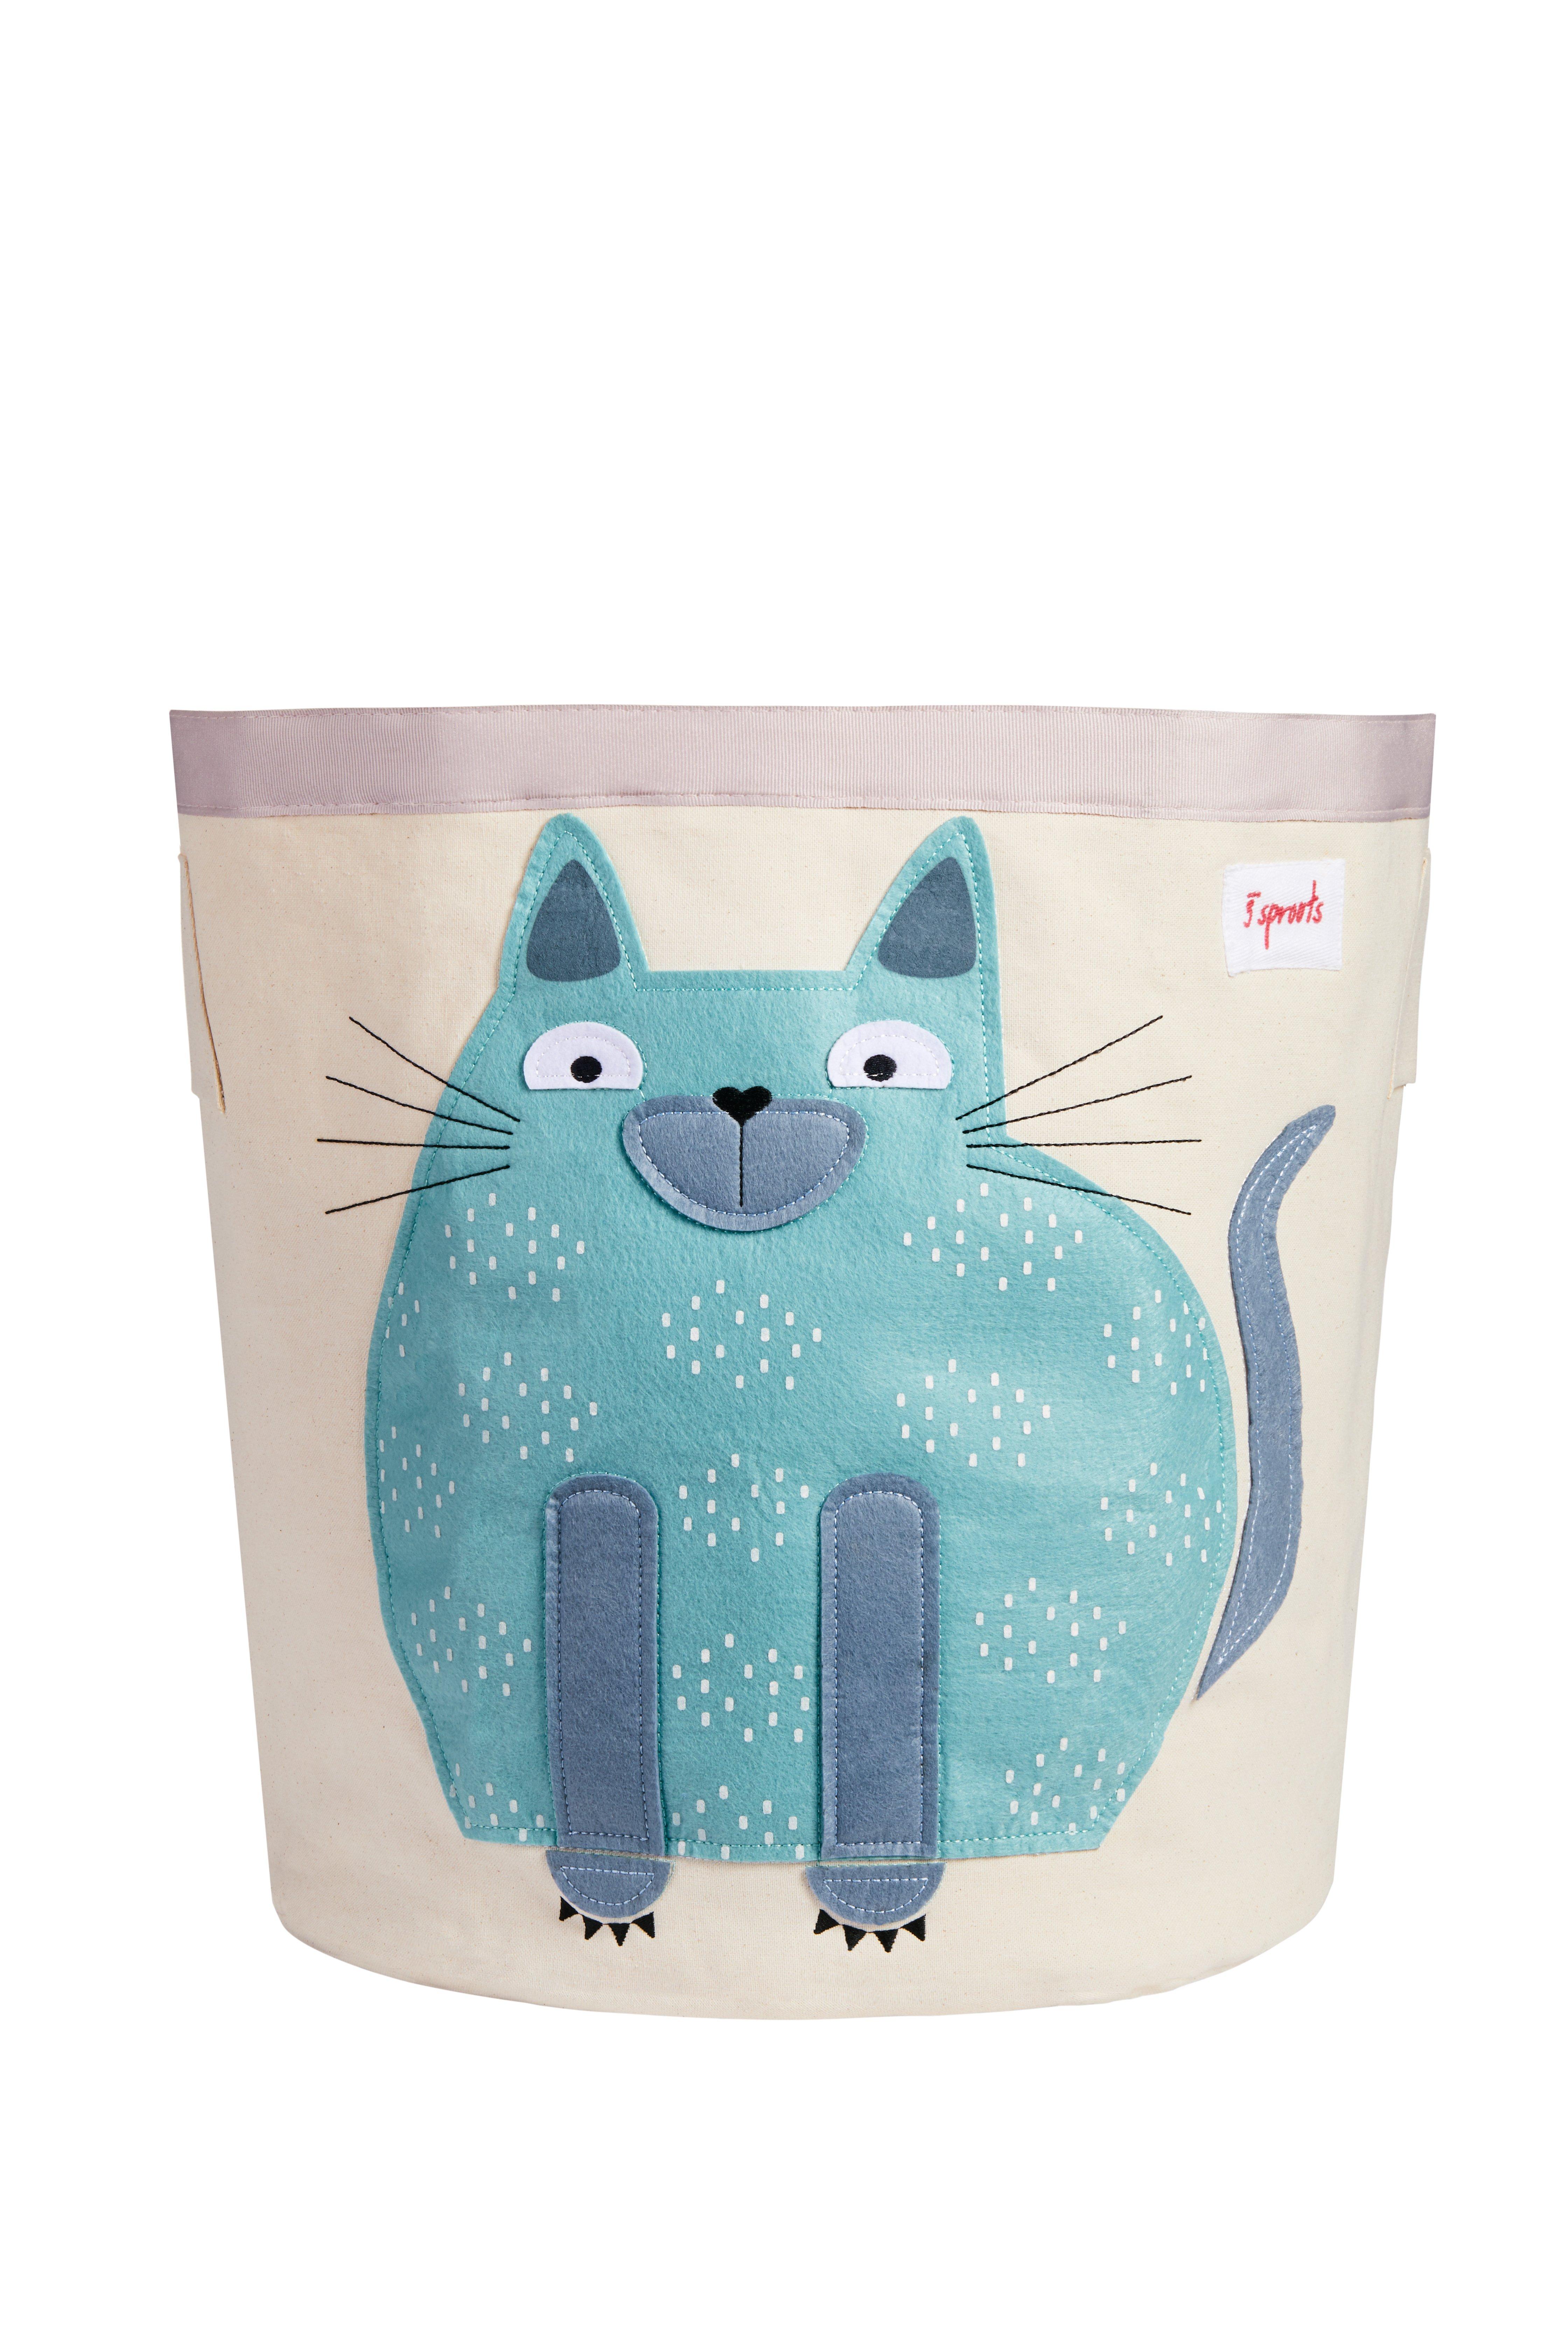 3 Sprouts - Storage Bin - Blue Cat